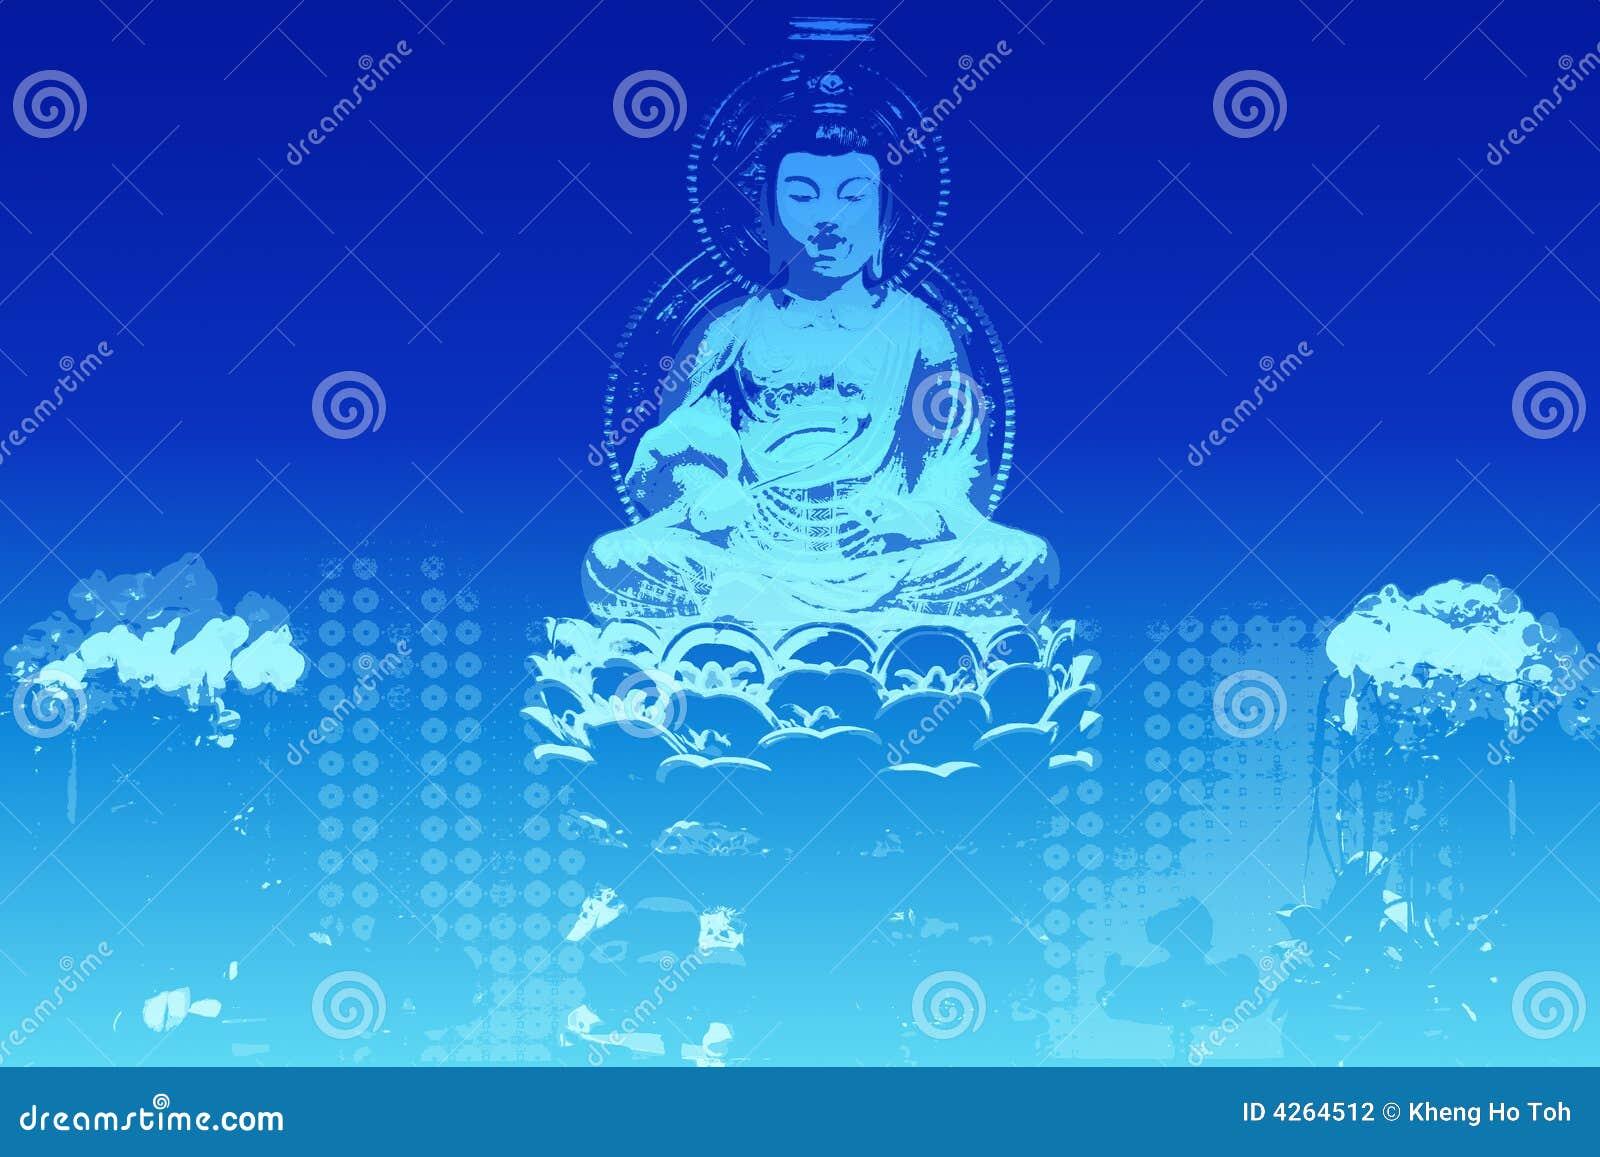 Buddha In A Zen State Background Stock Illustration ... | 1300 x 957 jpeg 113kB